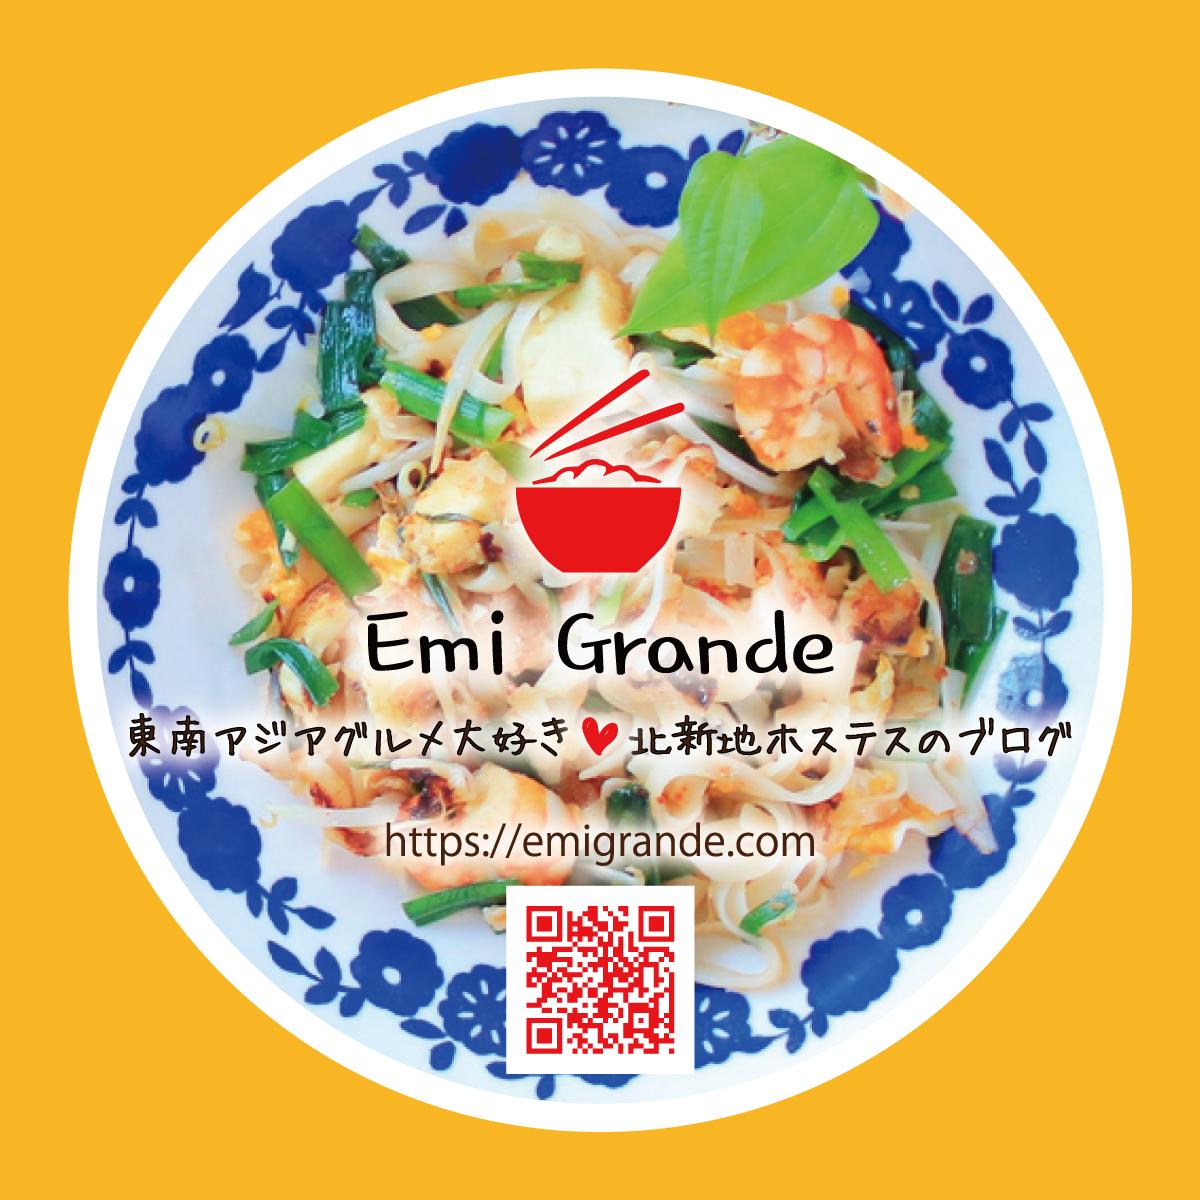 Emi Grande 様 オリジナルステッカーサンプルデザイン4